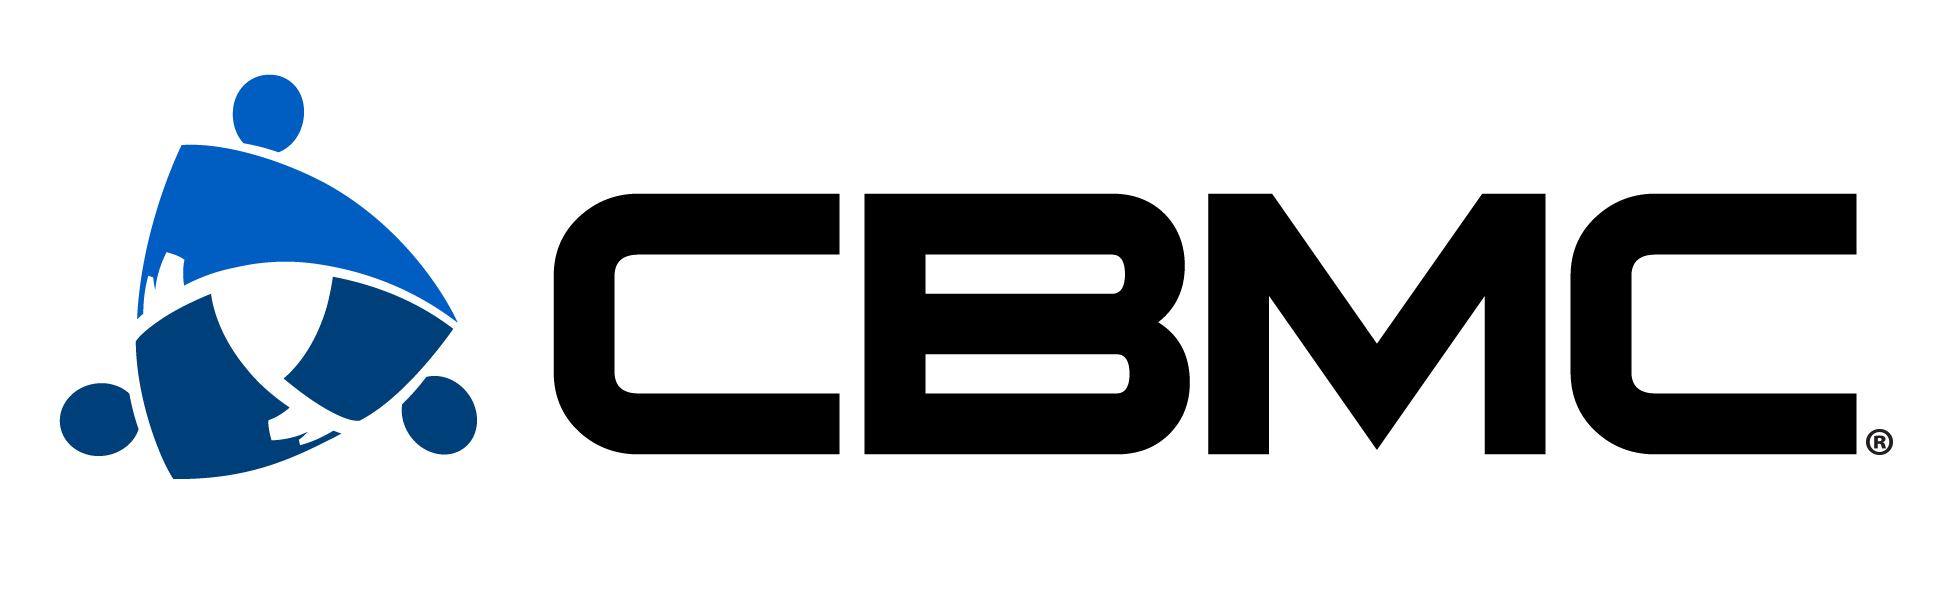 official CBMC logo straight across